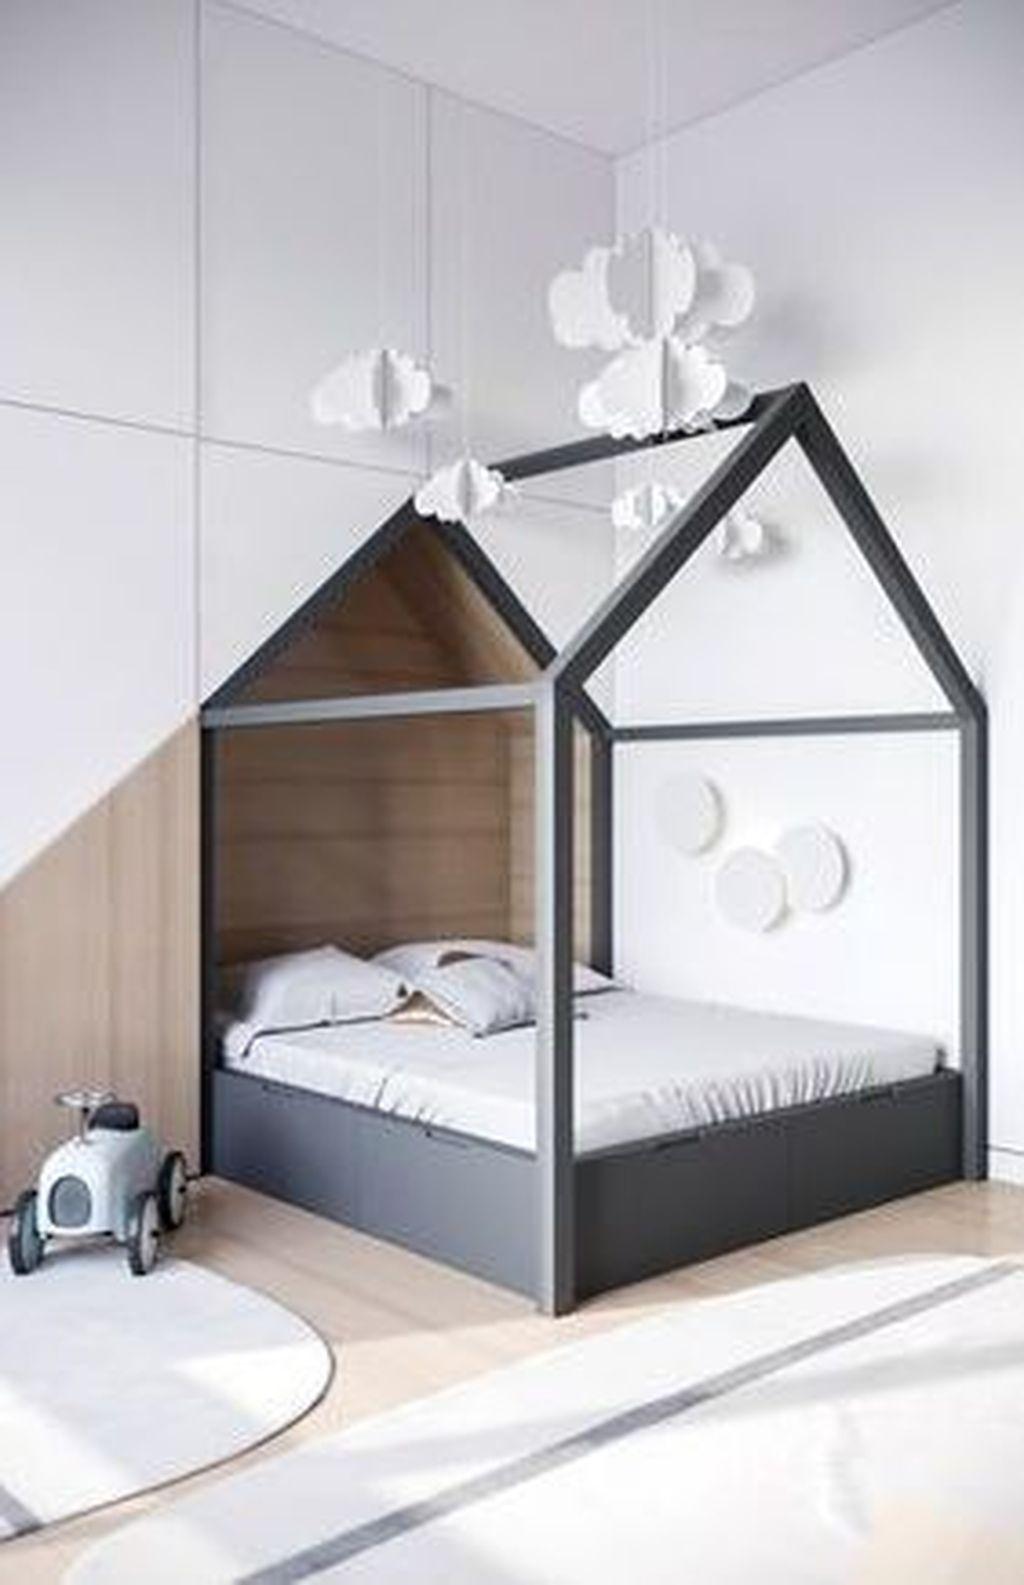 Charming Kids Bedroom Design Ideas For Dream Homes 22